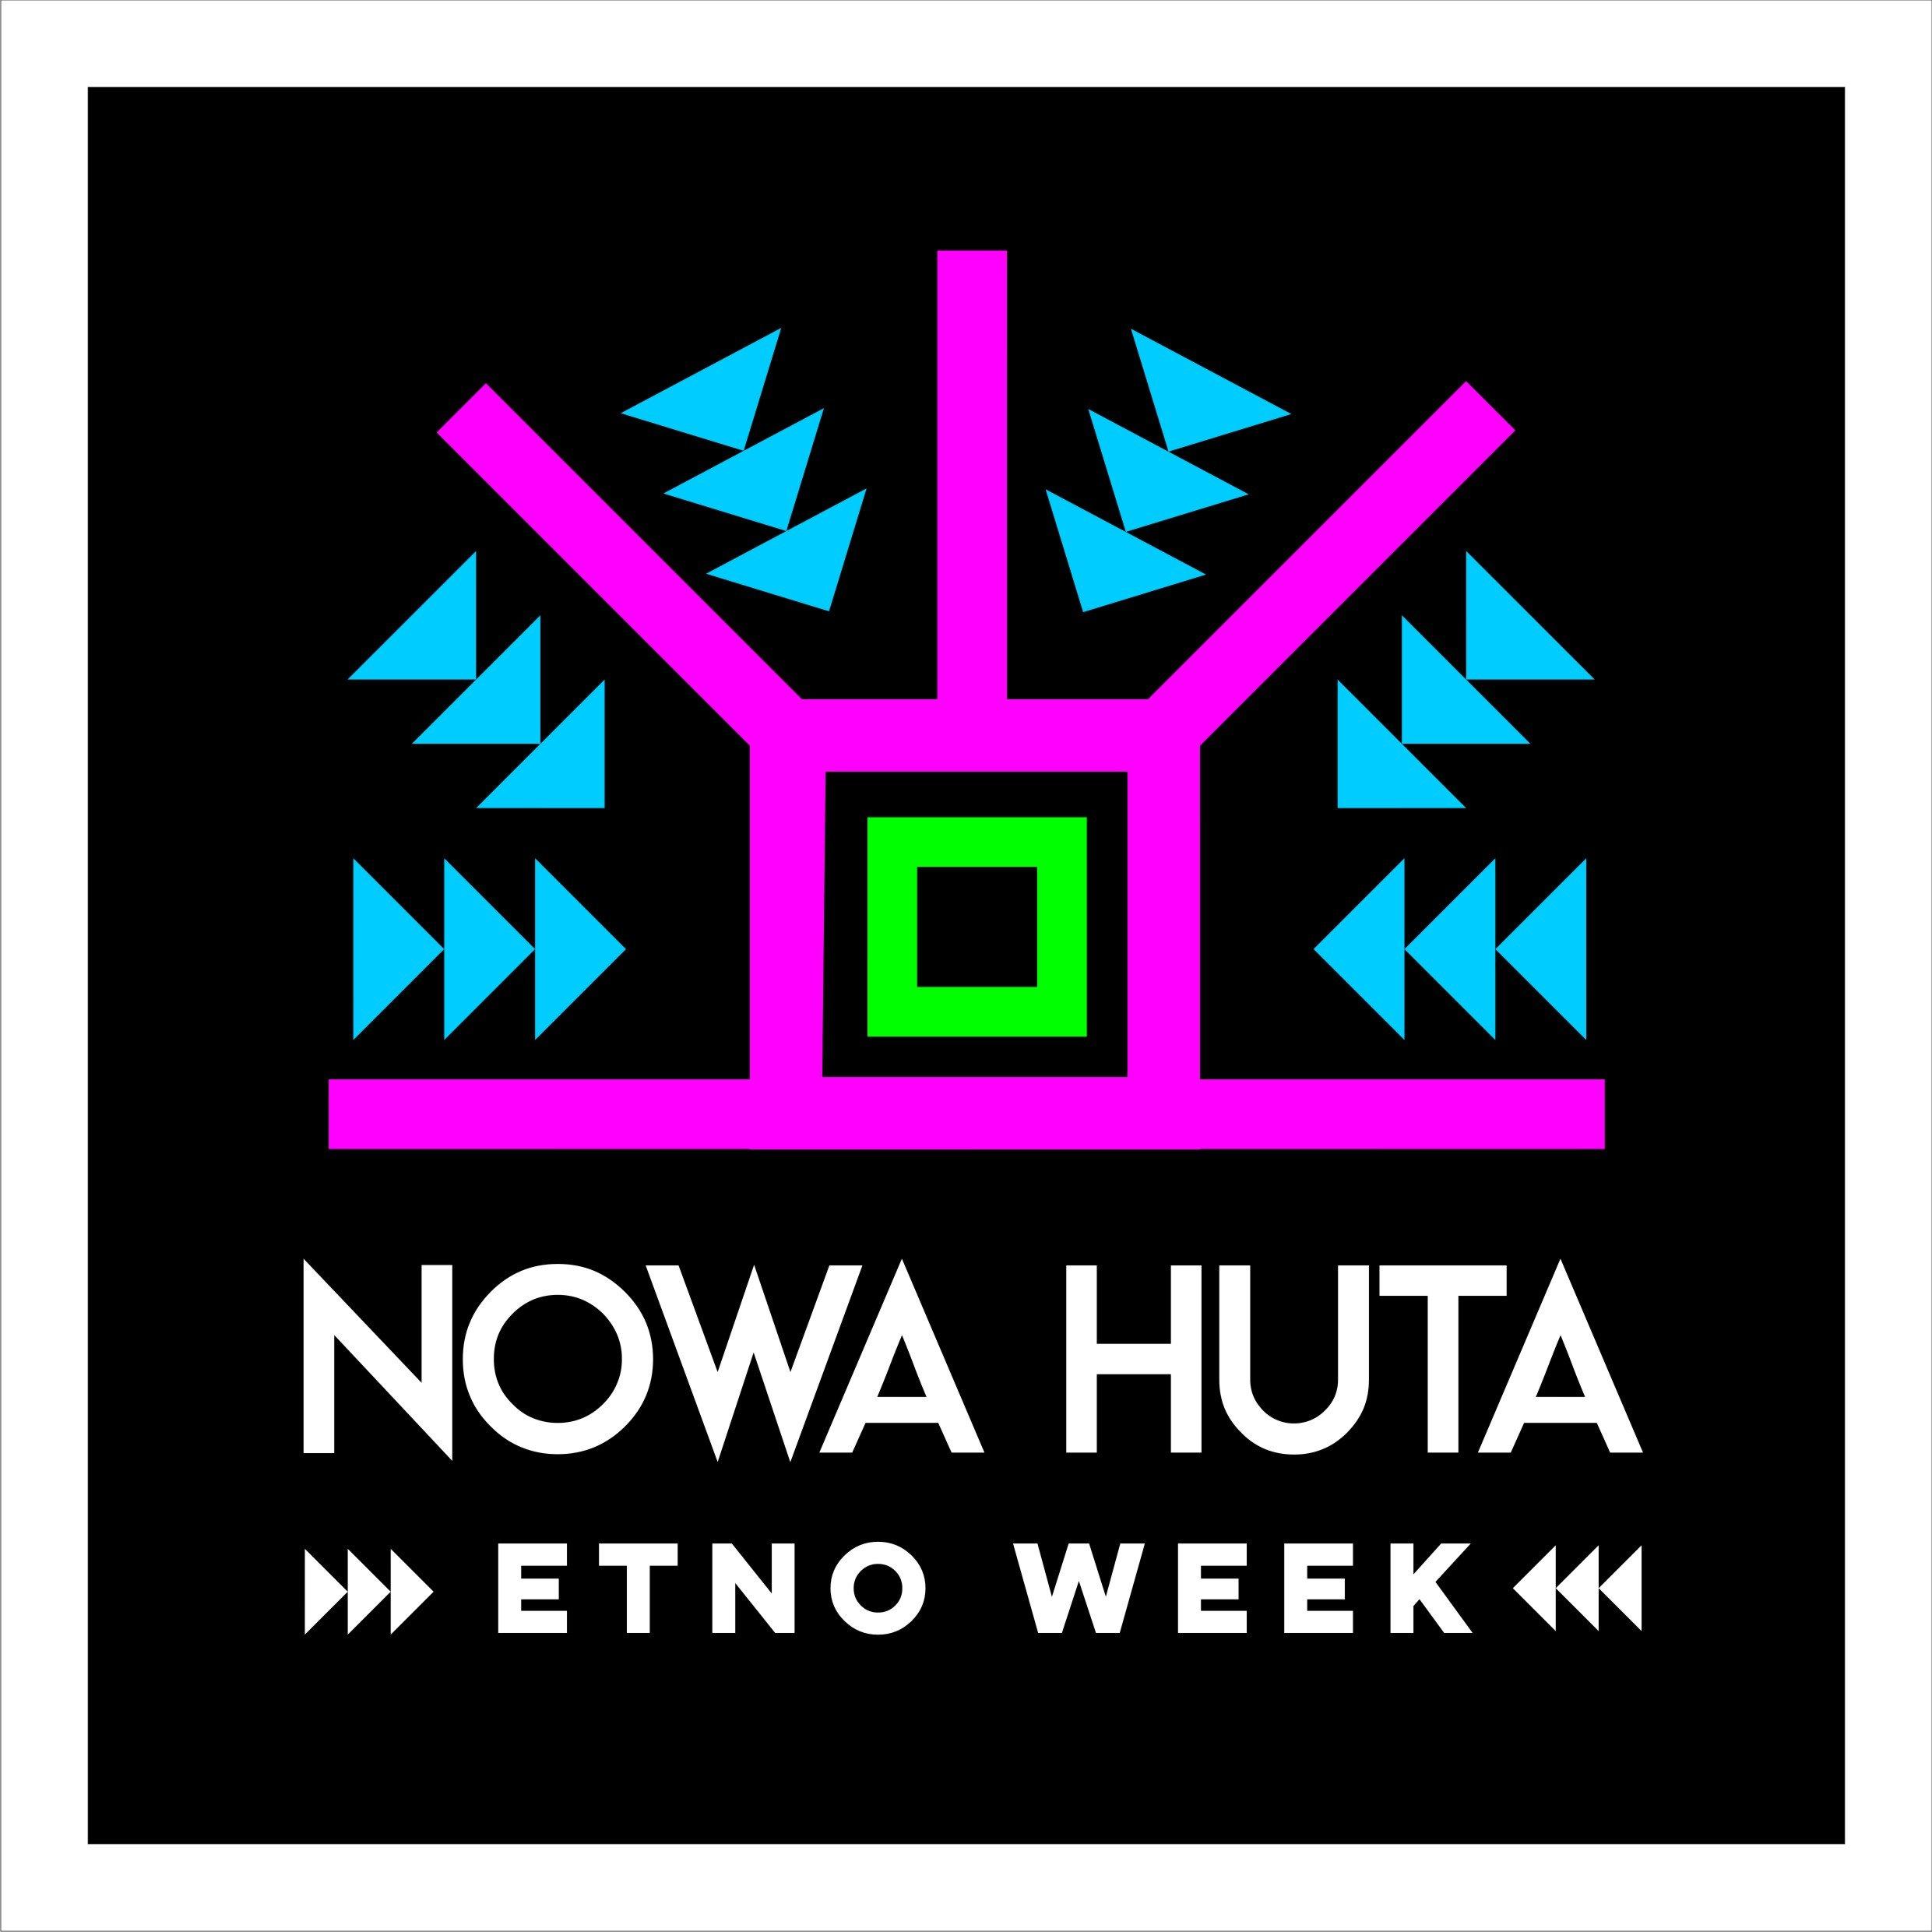 Nowa Huta Etno Week